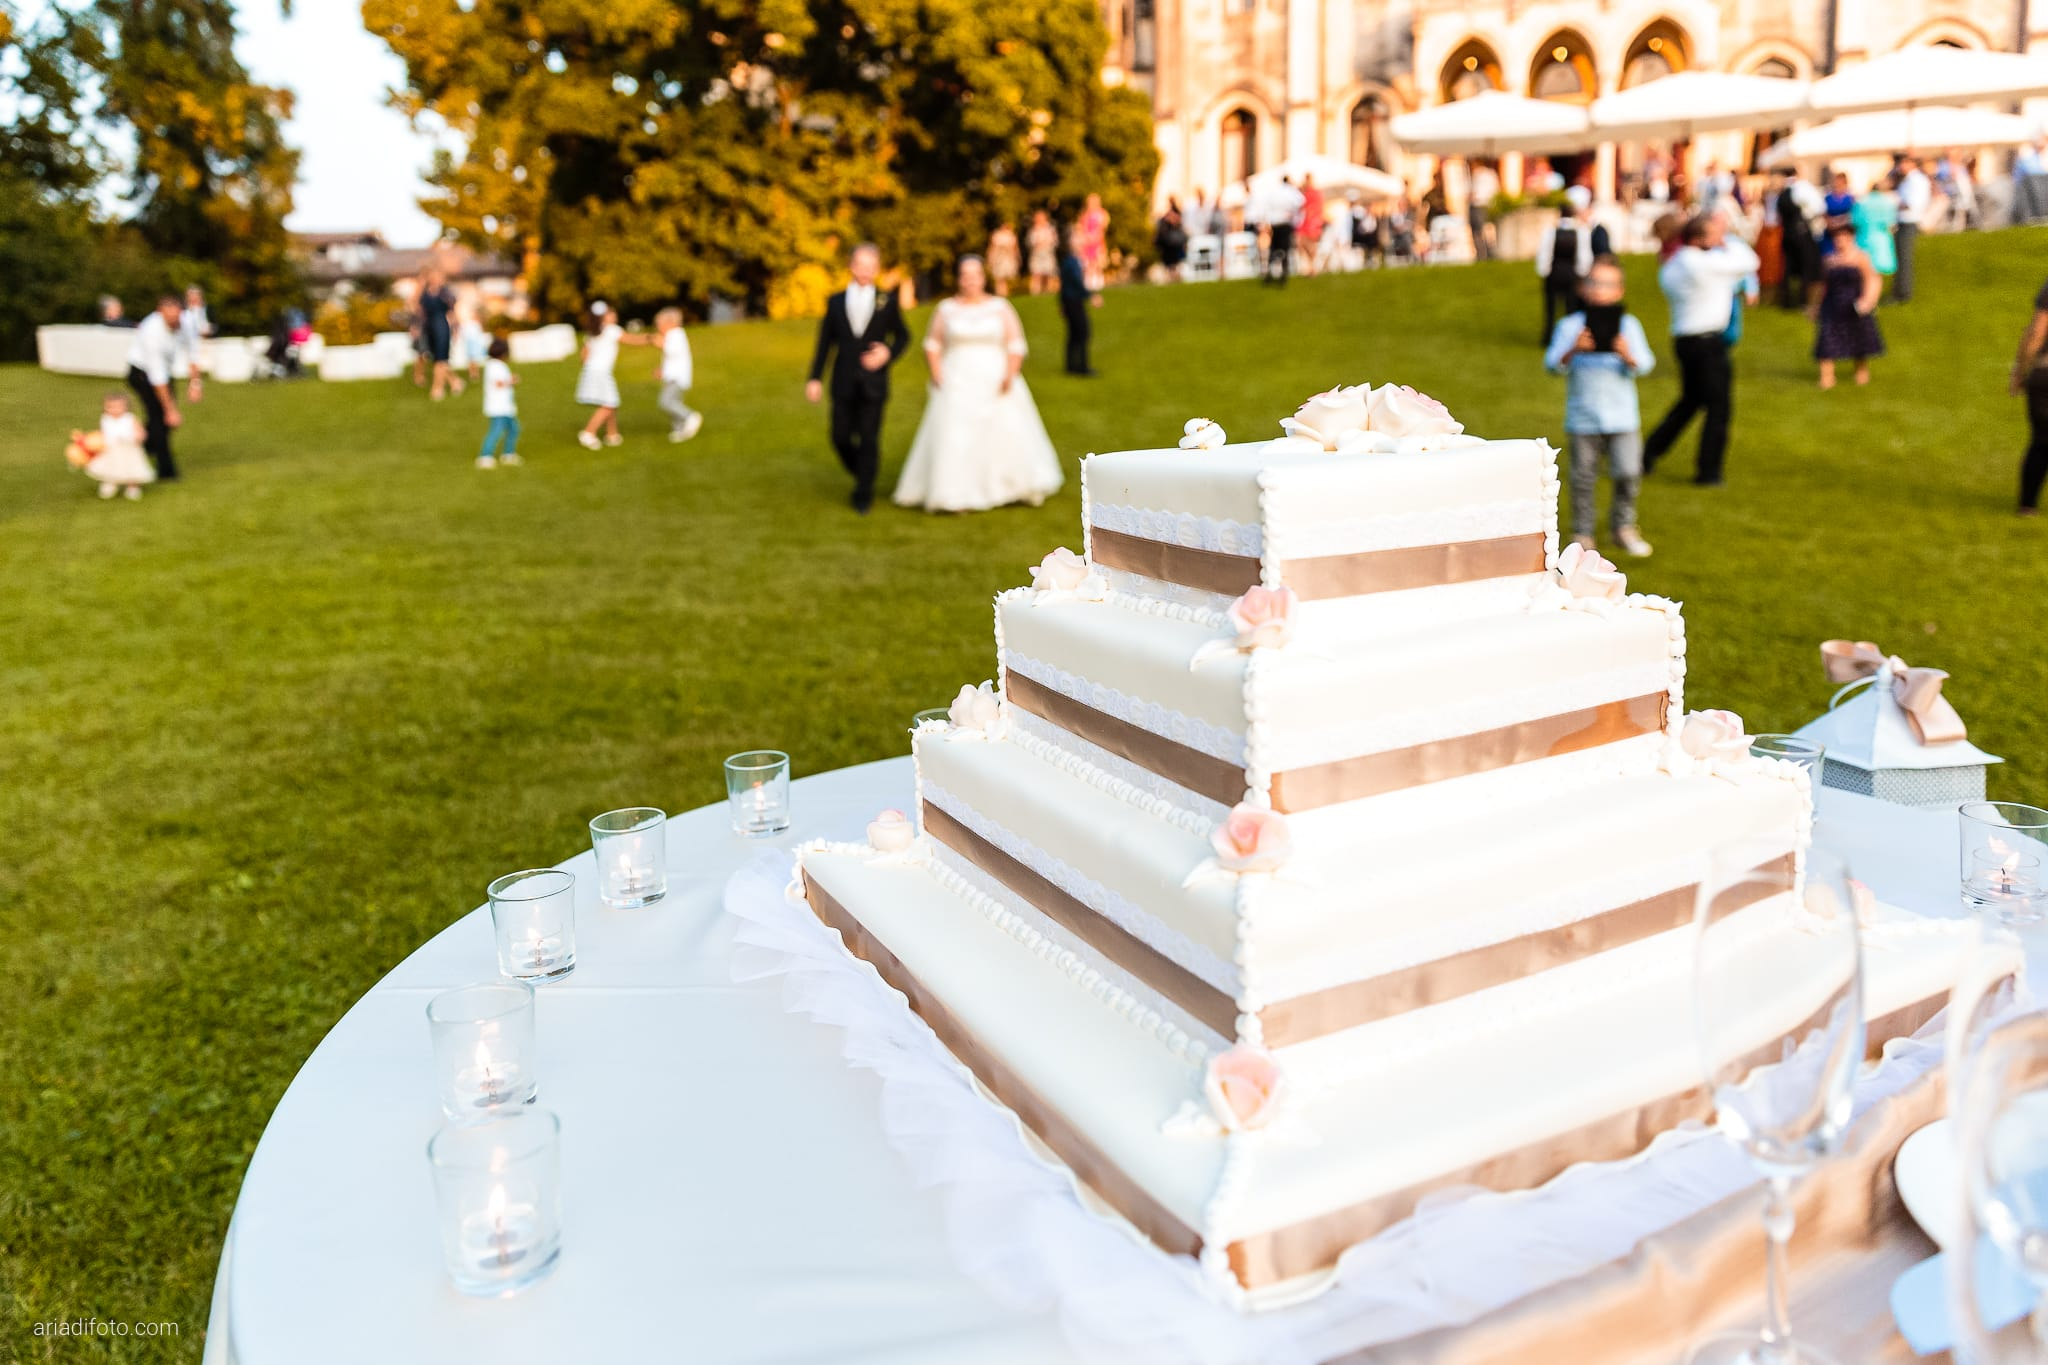 Eleonora Andrea Matrimonio Castello Papadopoli Giol San Polo Piave Treviso ricevimento torta